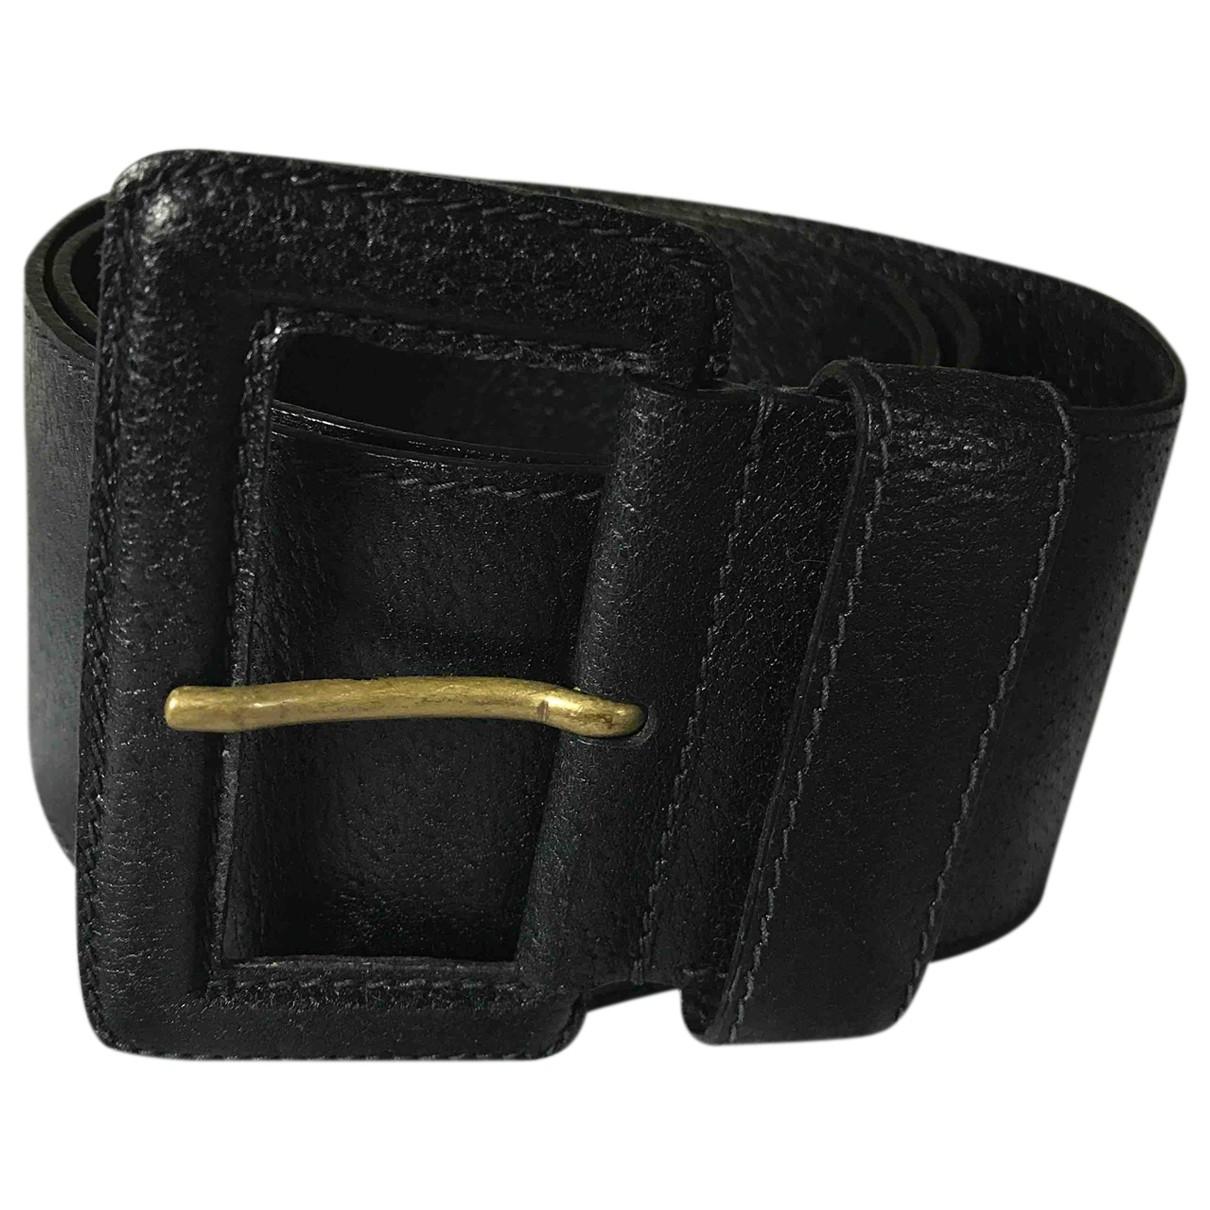 Prada \N Black Leather belt for Women 75 cm